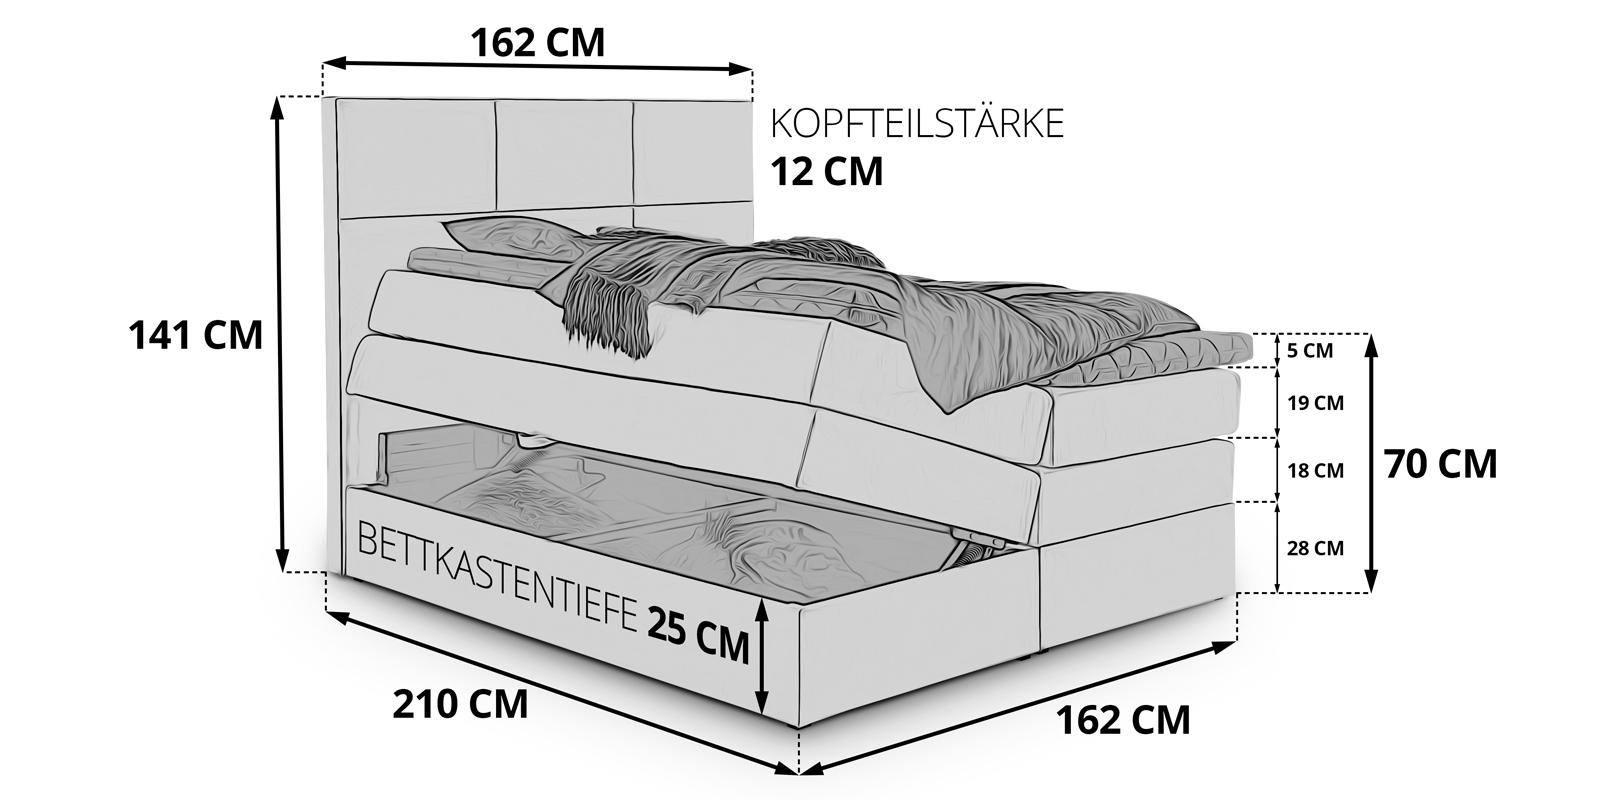 Boxspringbett Weiss Bettkasten Stauraum York 160x200 Skizze